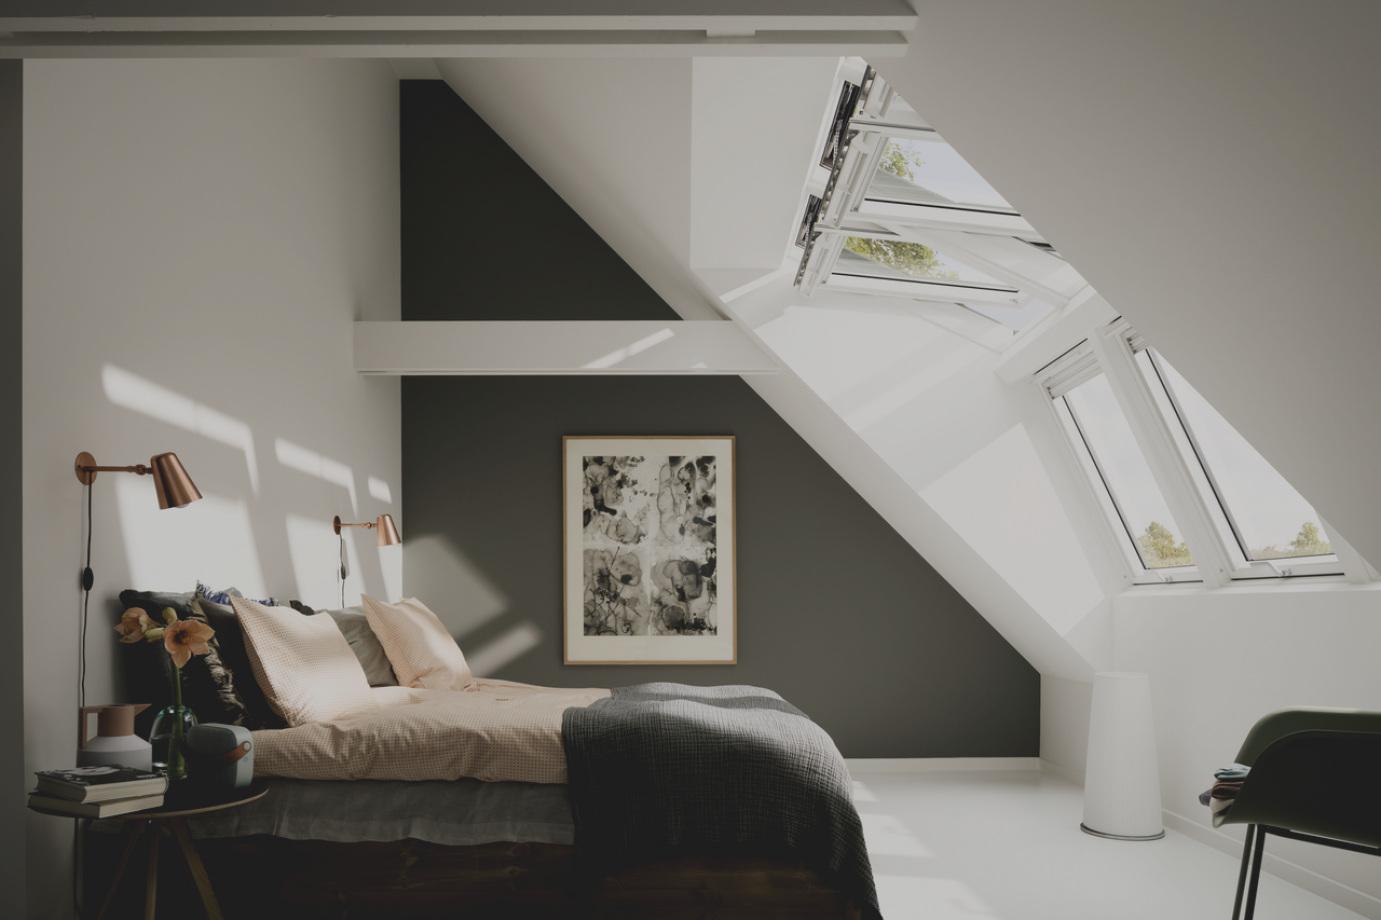 combles ech. Black Bedroom Furniture Sets. Home Design Ideas